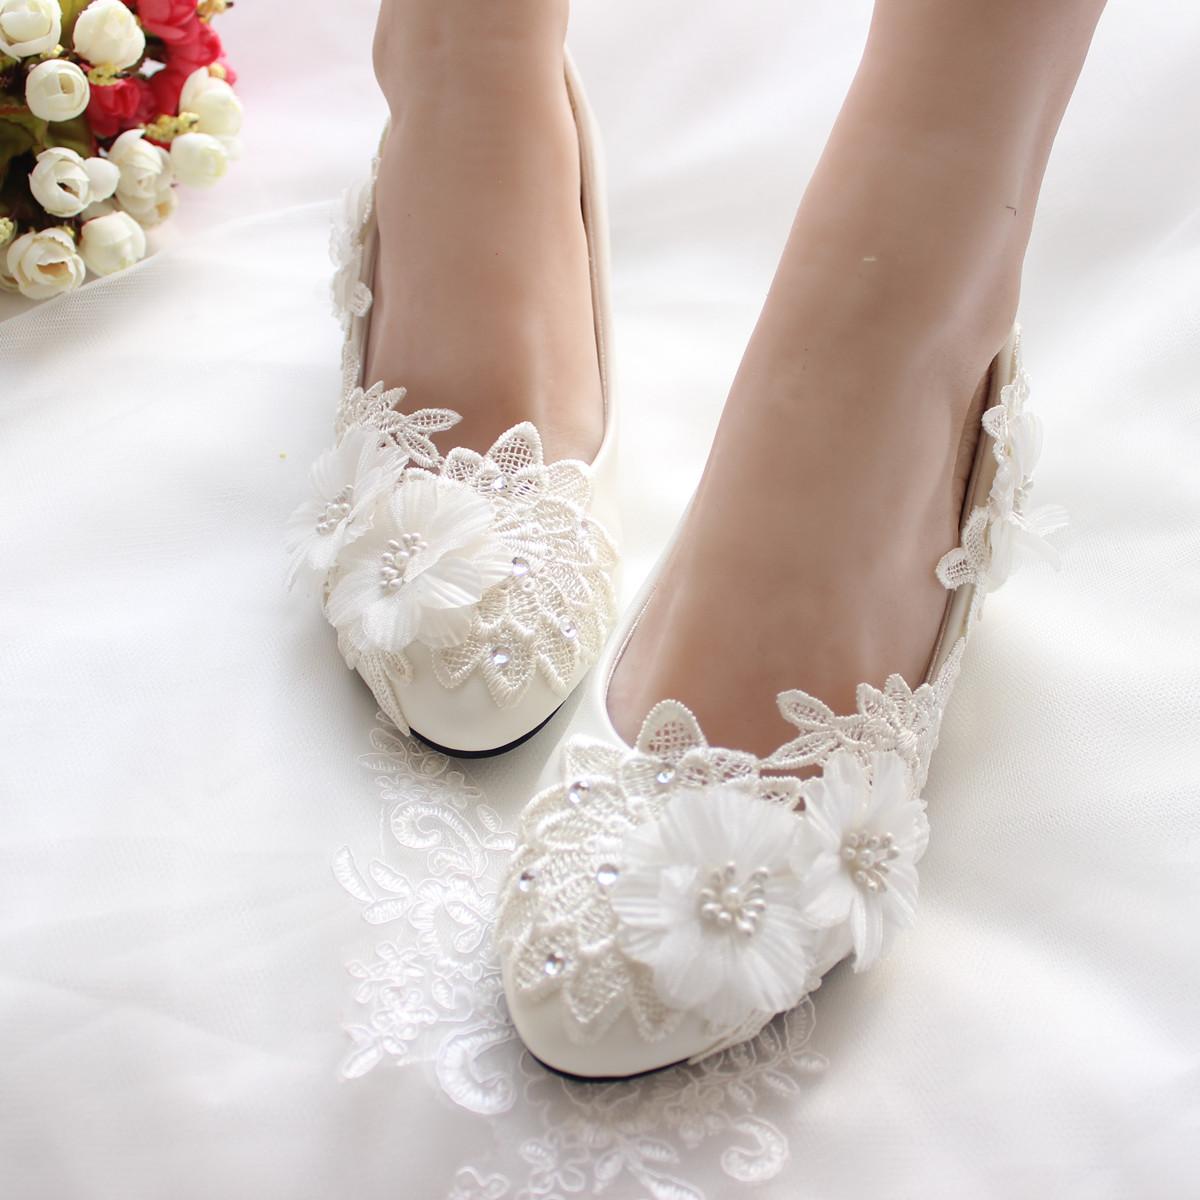 3CM 4.5CM 8.5CM 11CM Ladies Bridal High Heels Ivory Women Shoes Lace Crystal Stone Pearl Flower Handmade Women Pumps Girl Shoes(China (Mainland))